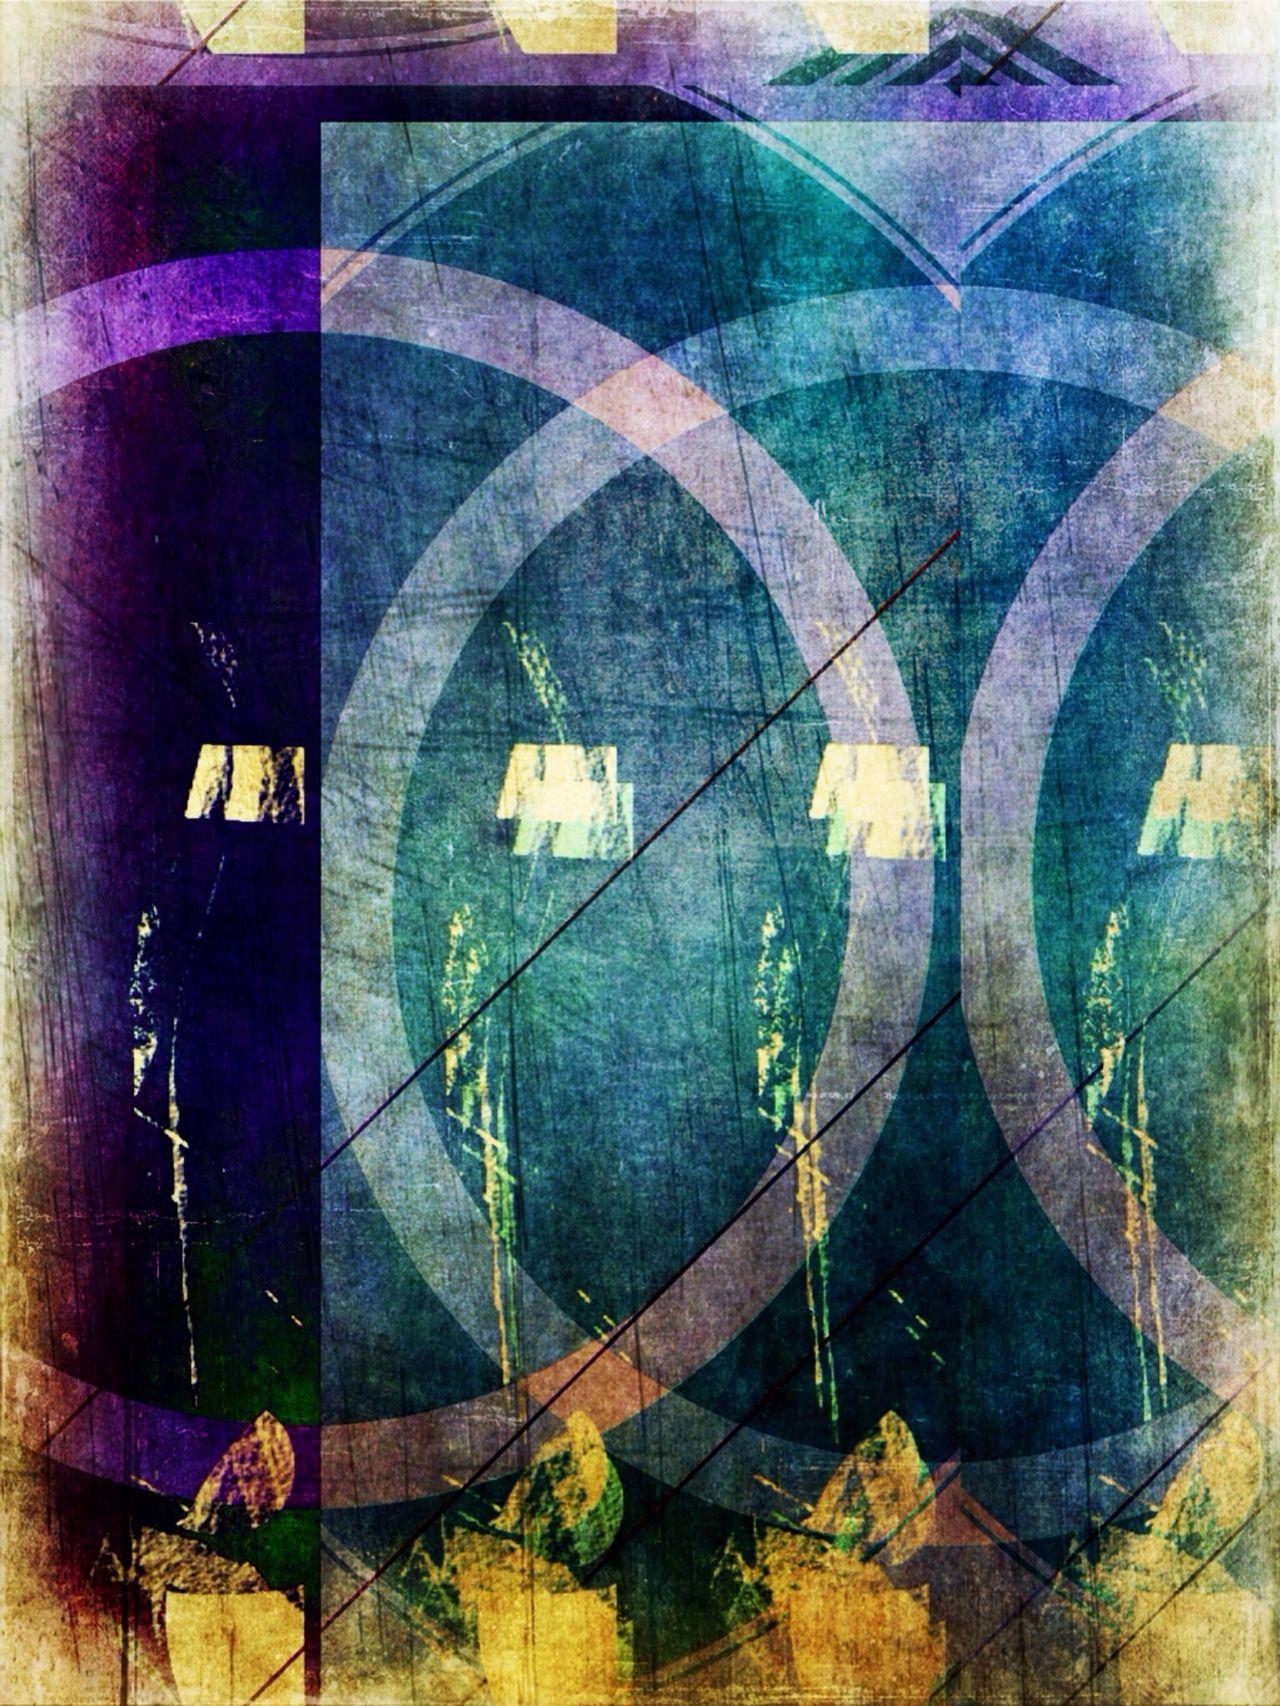 Artism 161 IPhoneArtism Mob Fiction NEM Painterly Art